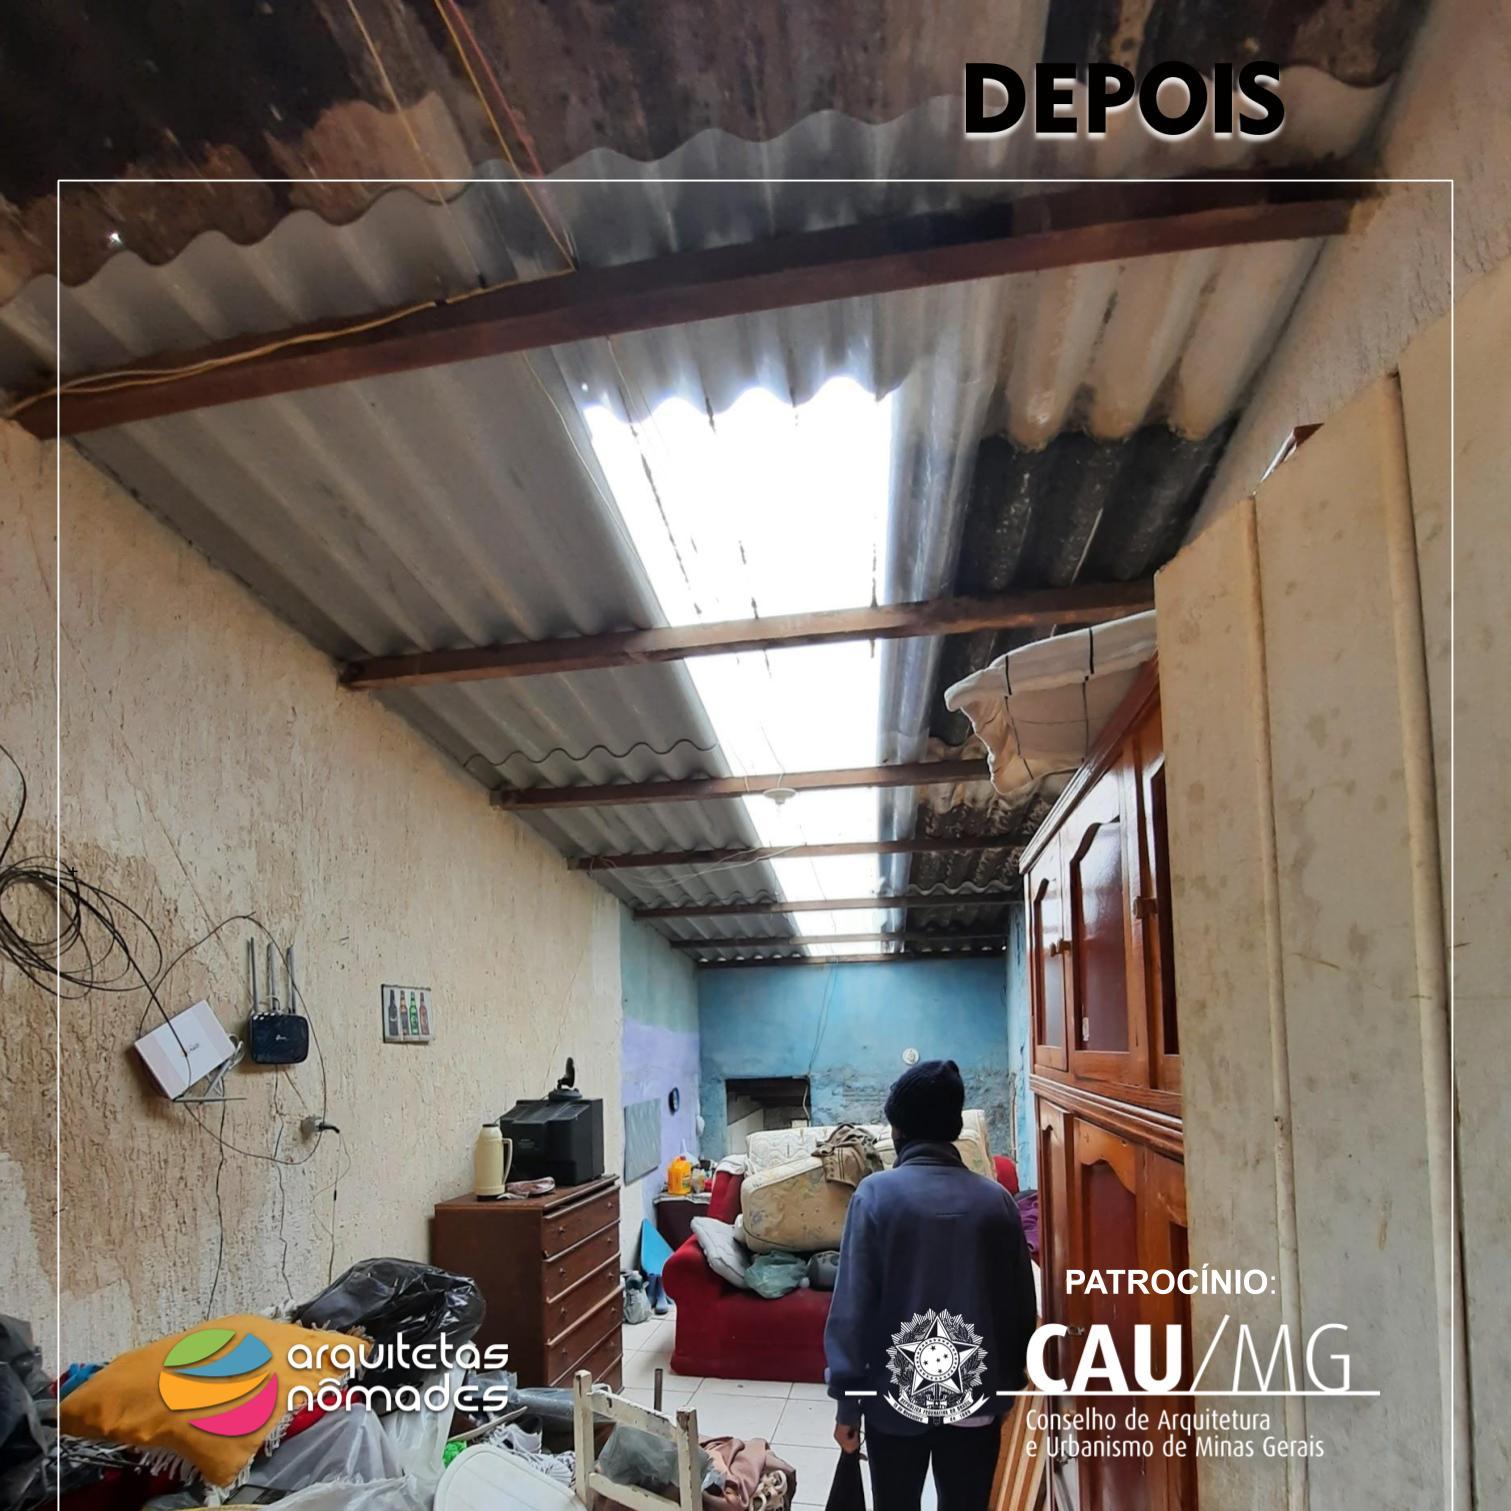 DEPOIS1 – rosangela